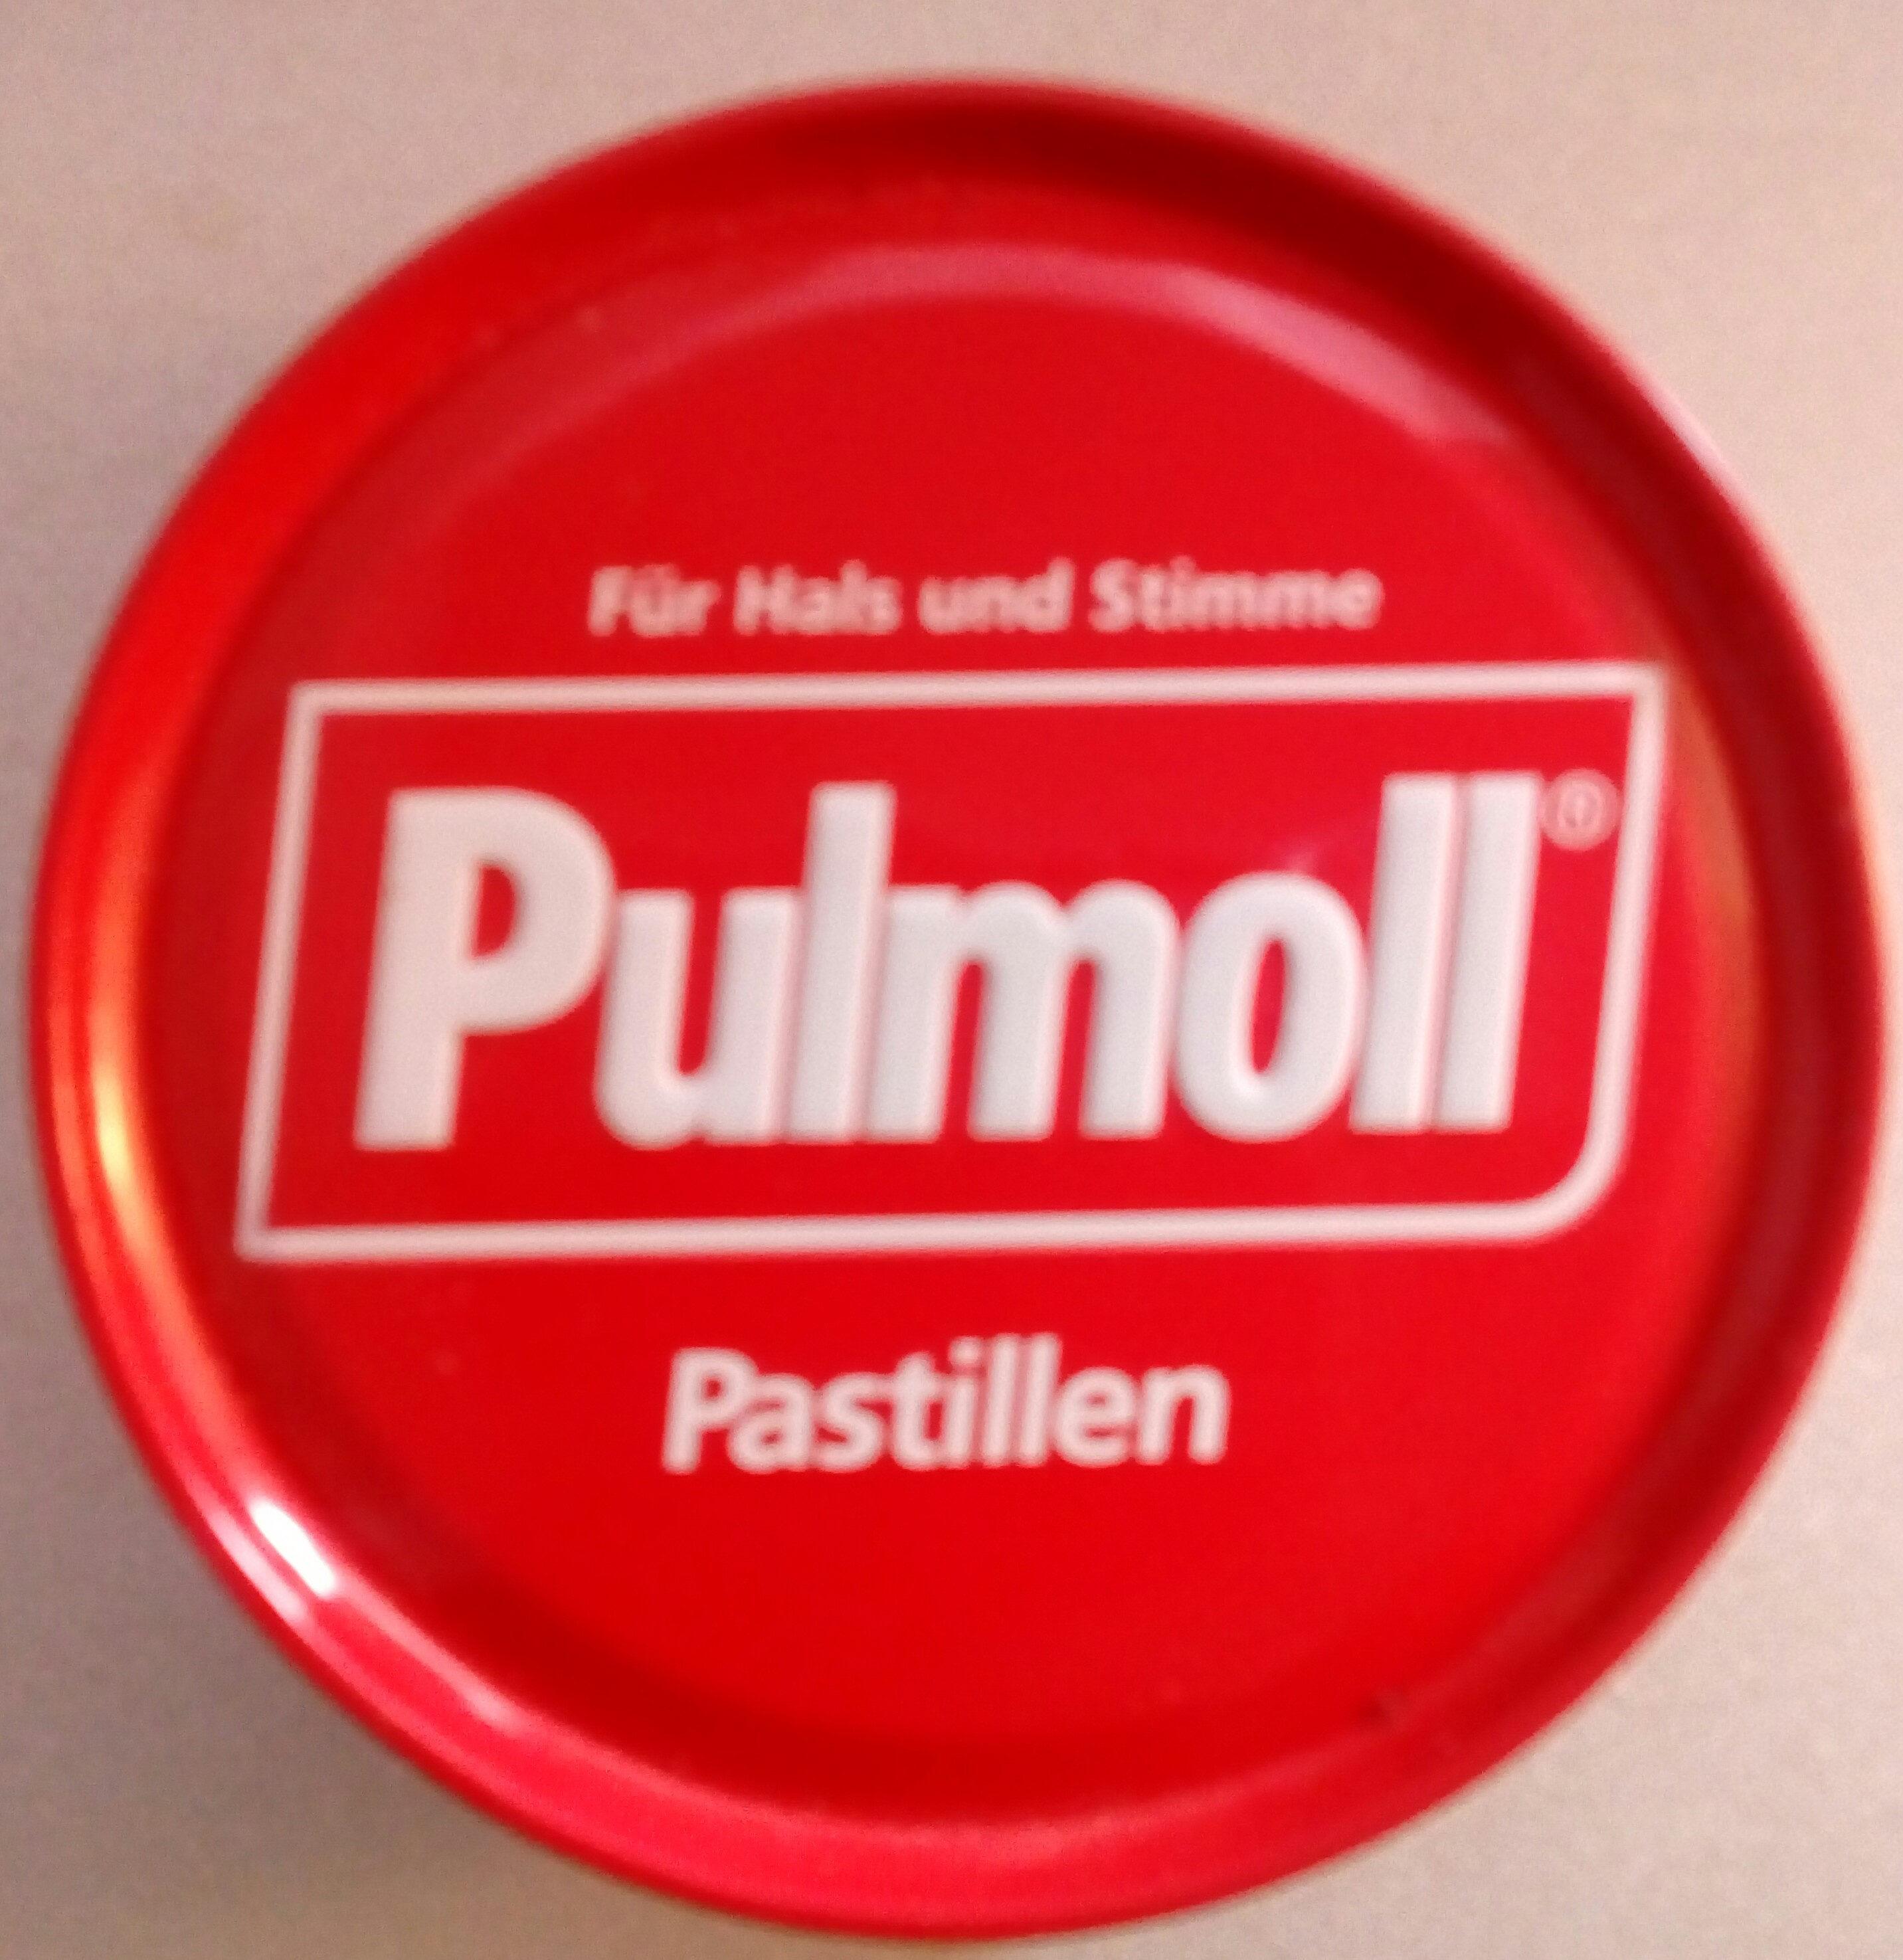 Pulmoll - Product